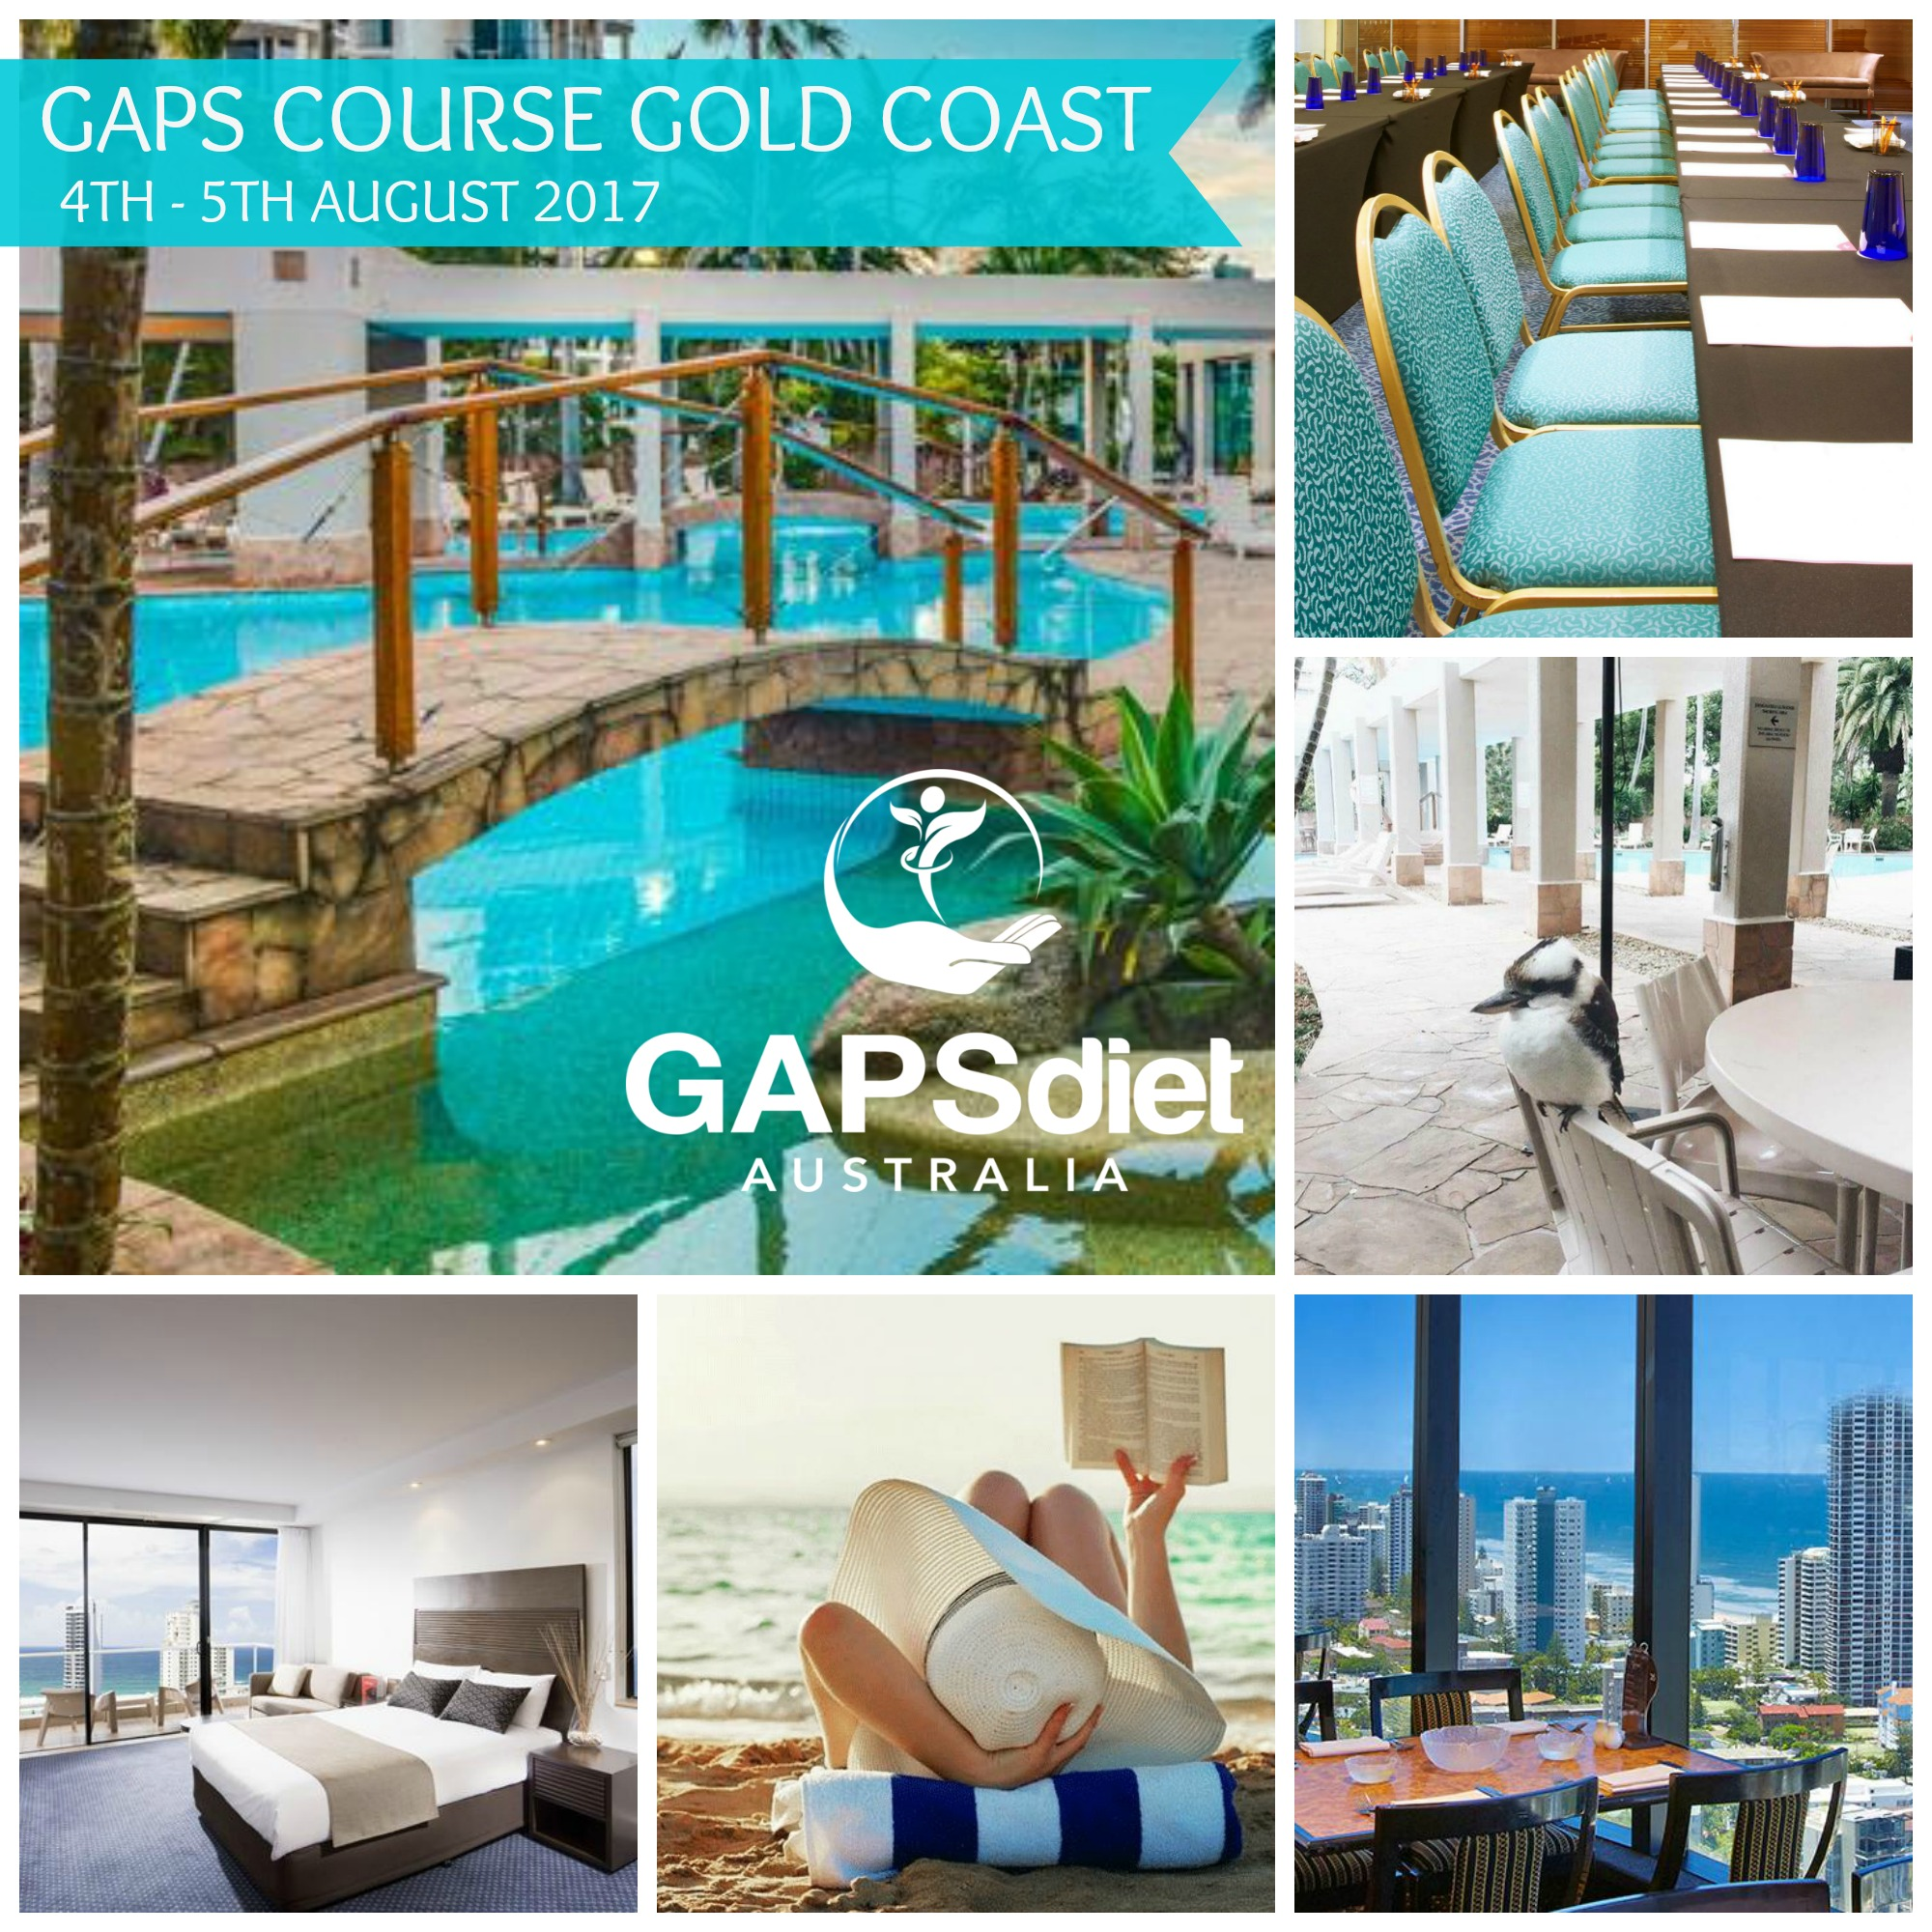 gaps-coure-gold-coast-2017.jpg